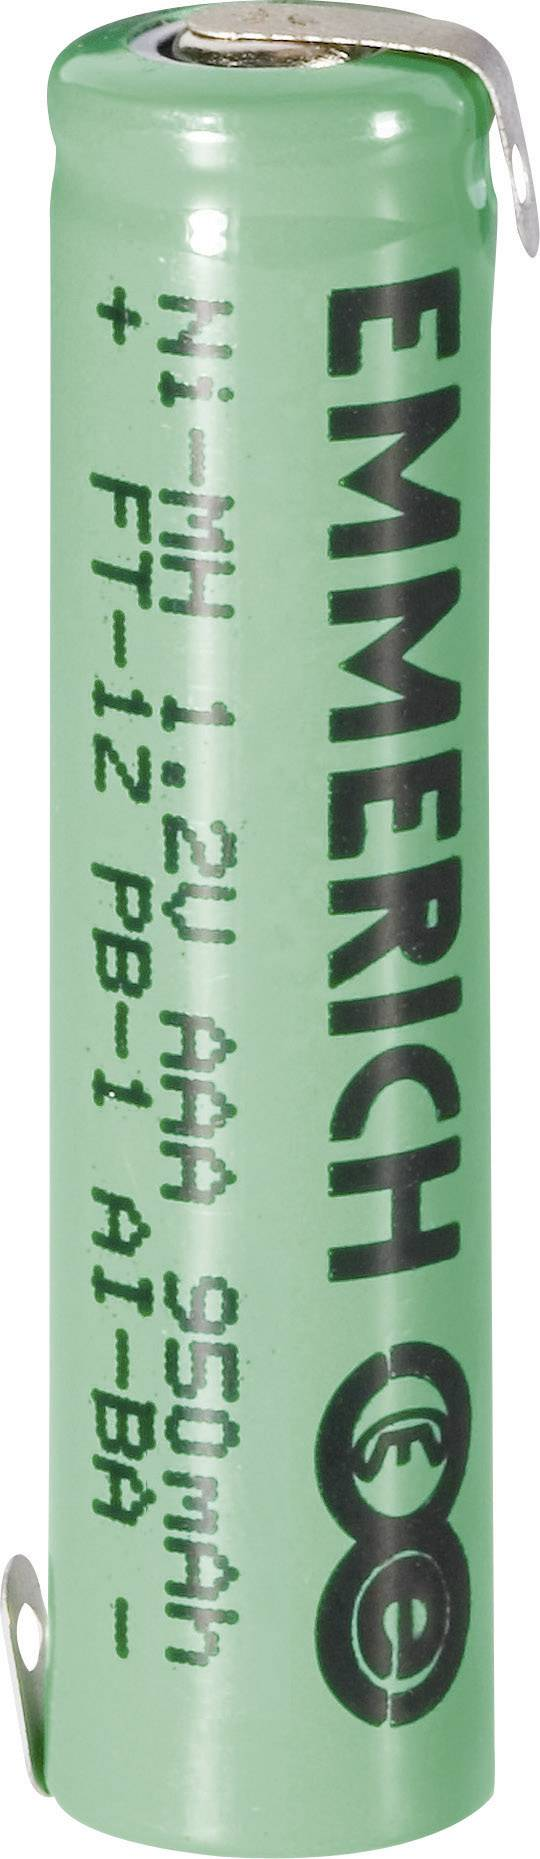 Emmerich NiMH-akumulátory so Z spájkovacími očkami AAA 950 mAh, FT-1Z